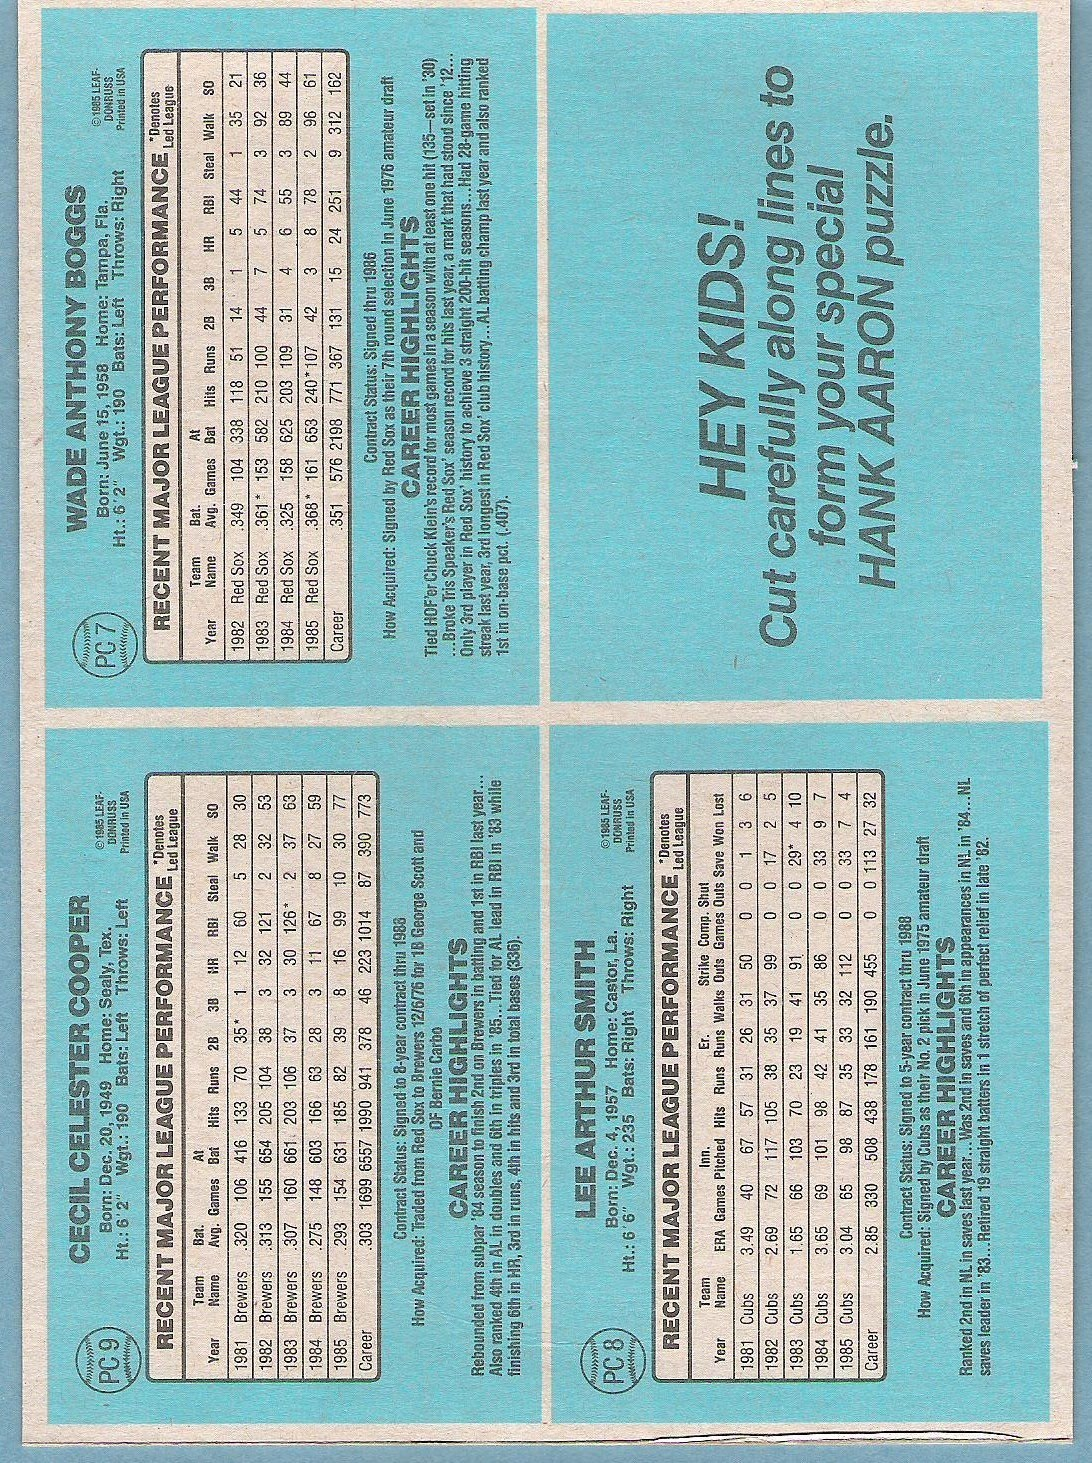 The Fleer Sticker Project 1986 Donruss Box Bottom Panels